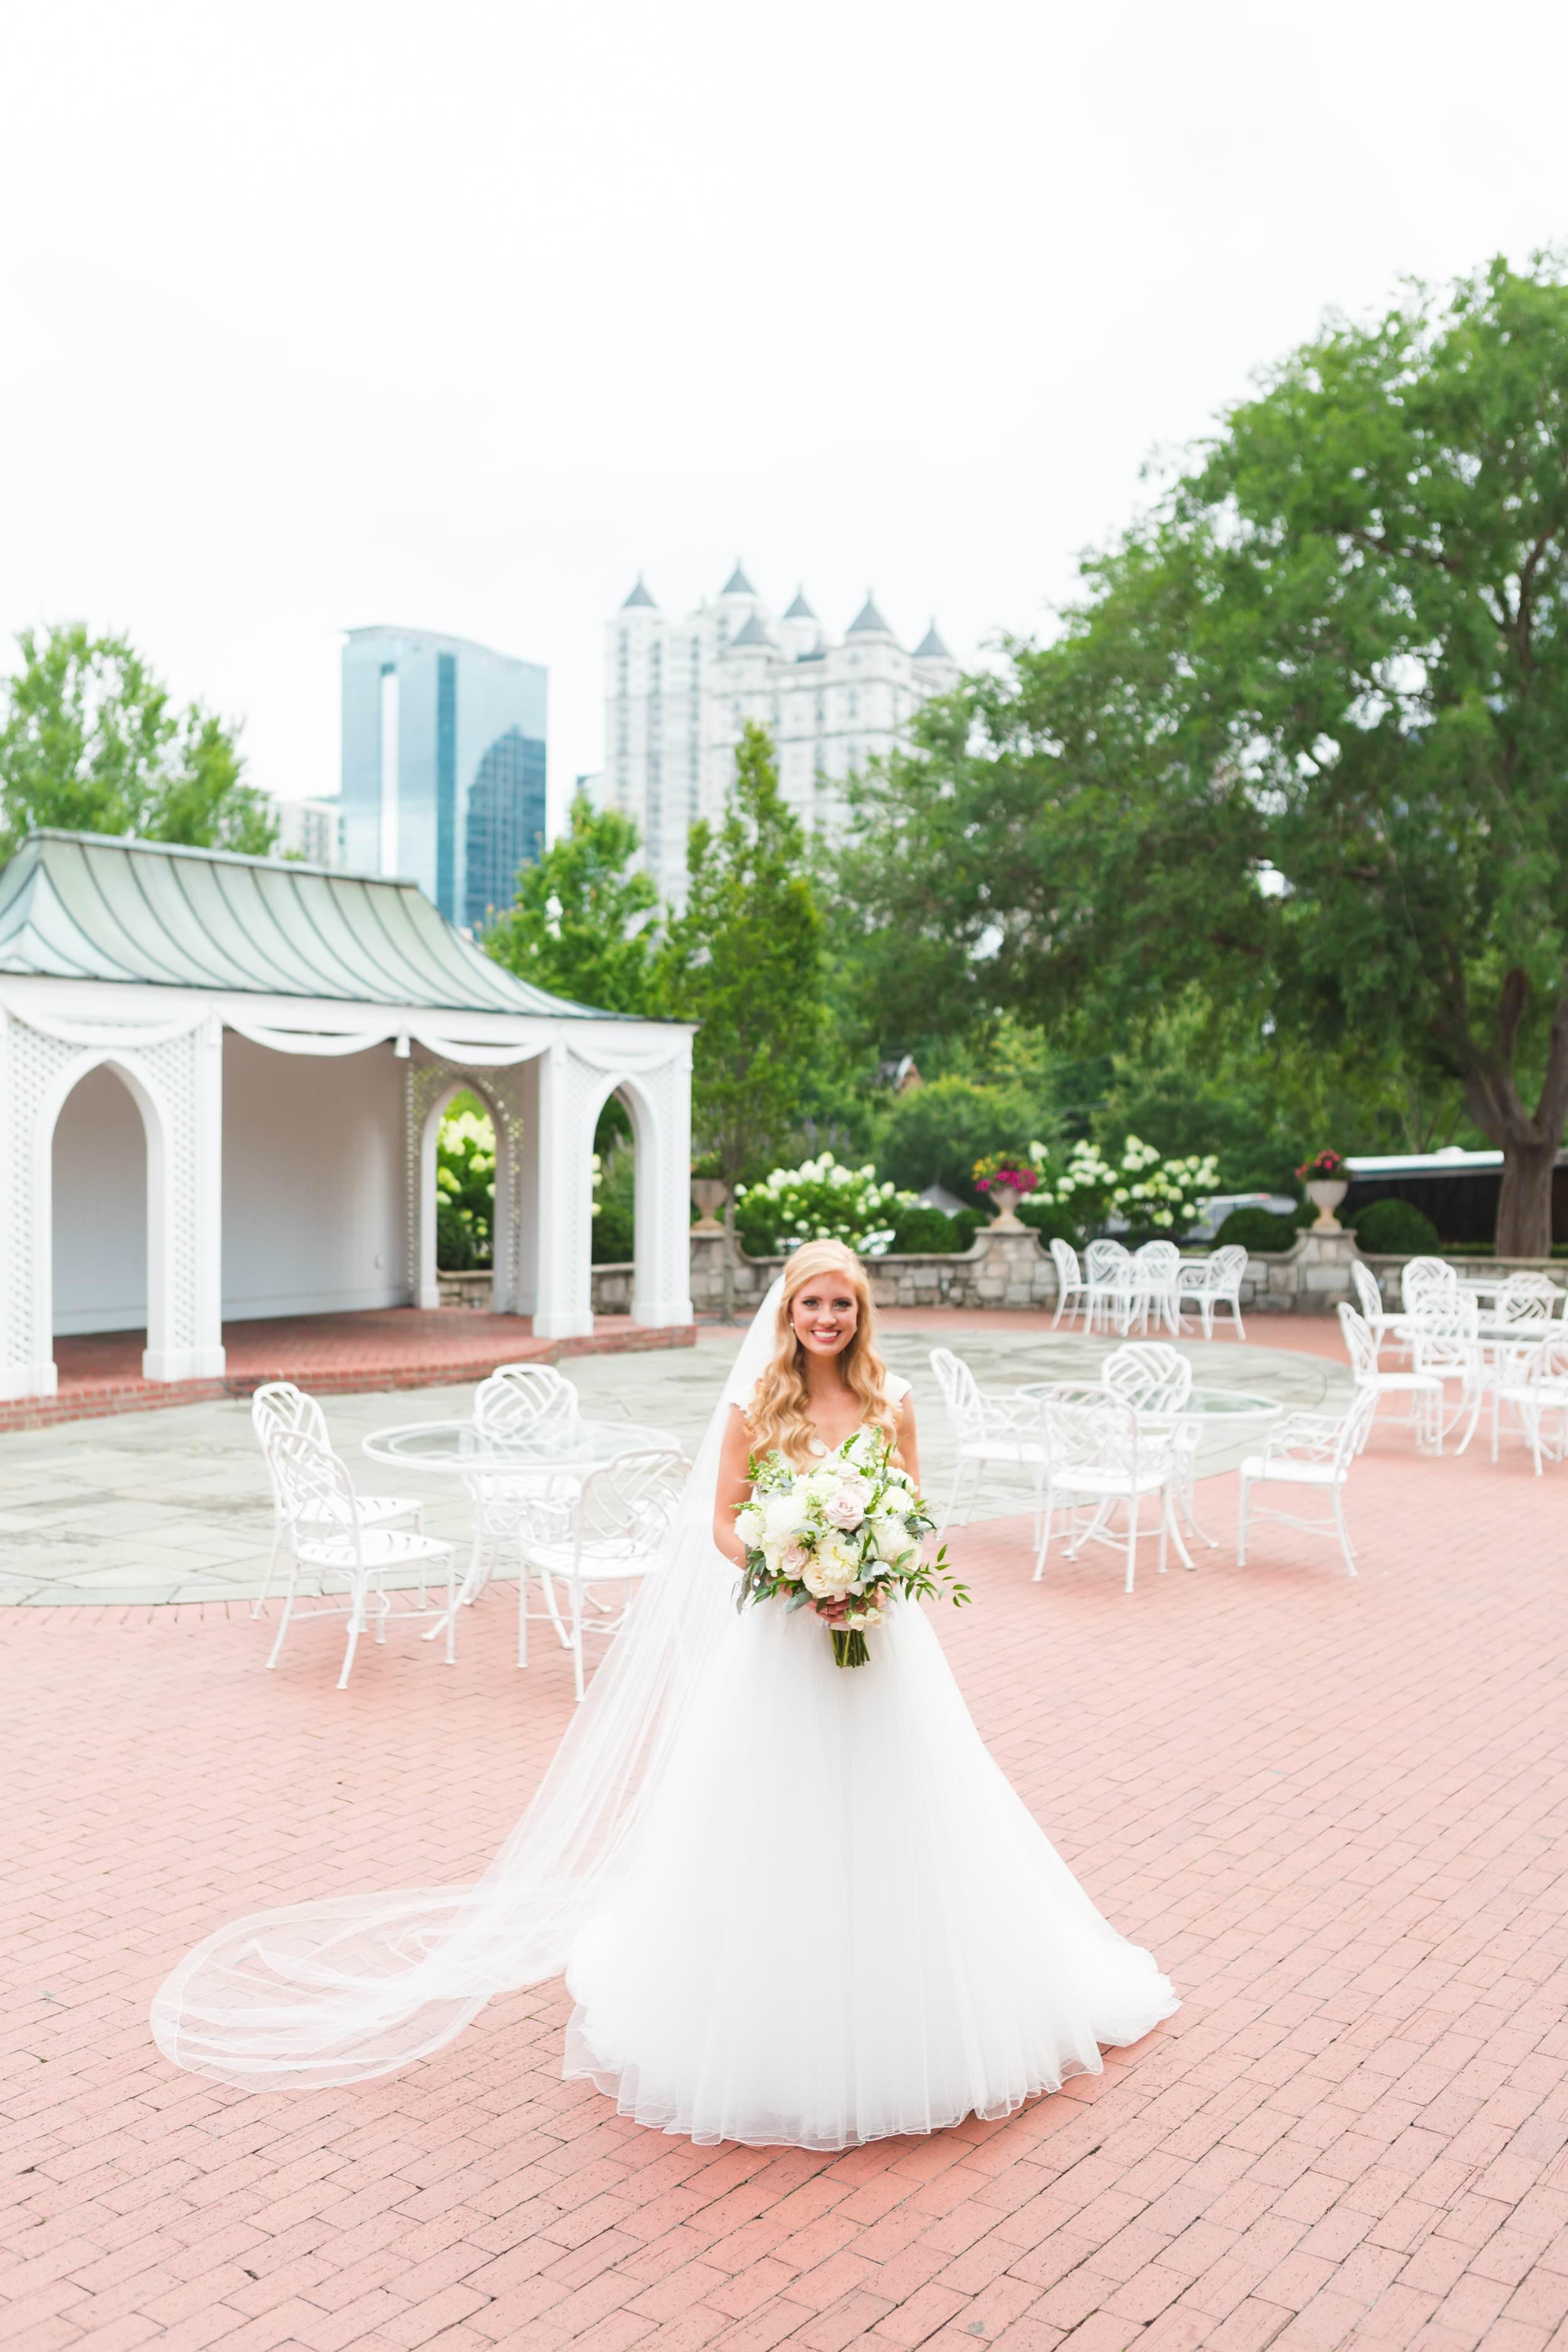 Piedmont-Driving-Club-Wedding-Photos019.jpg